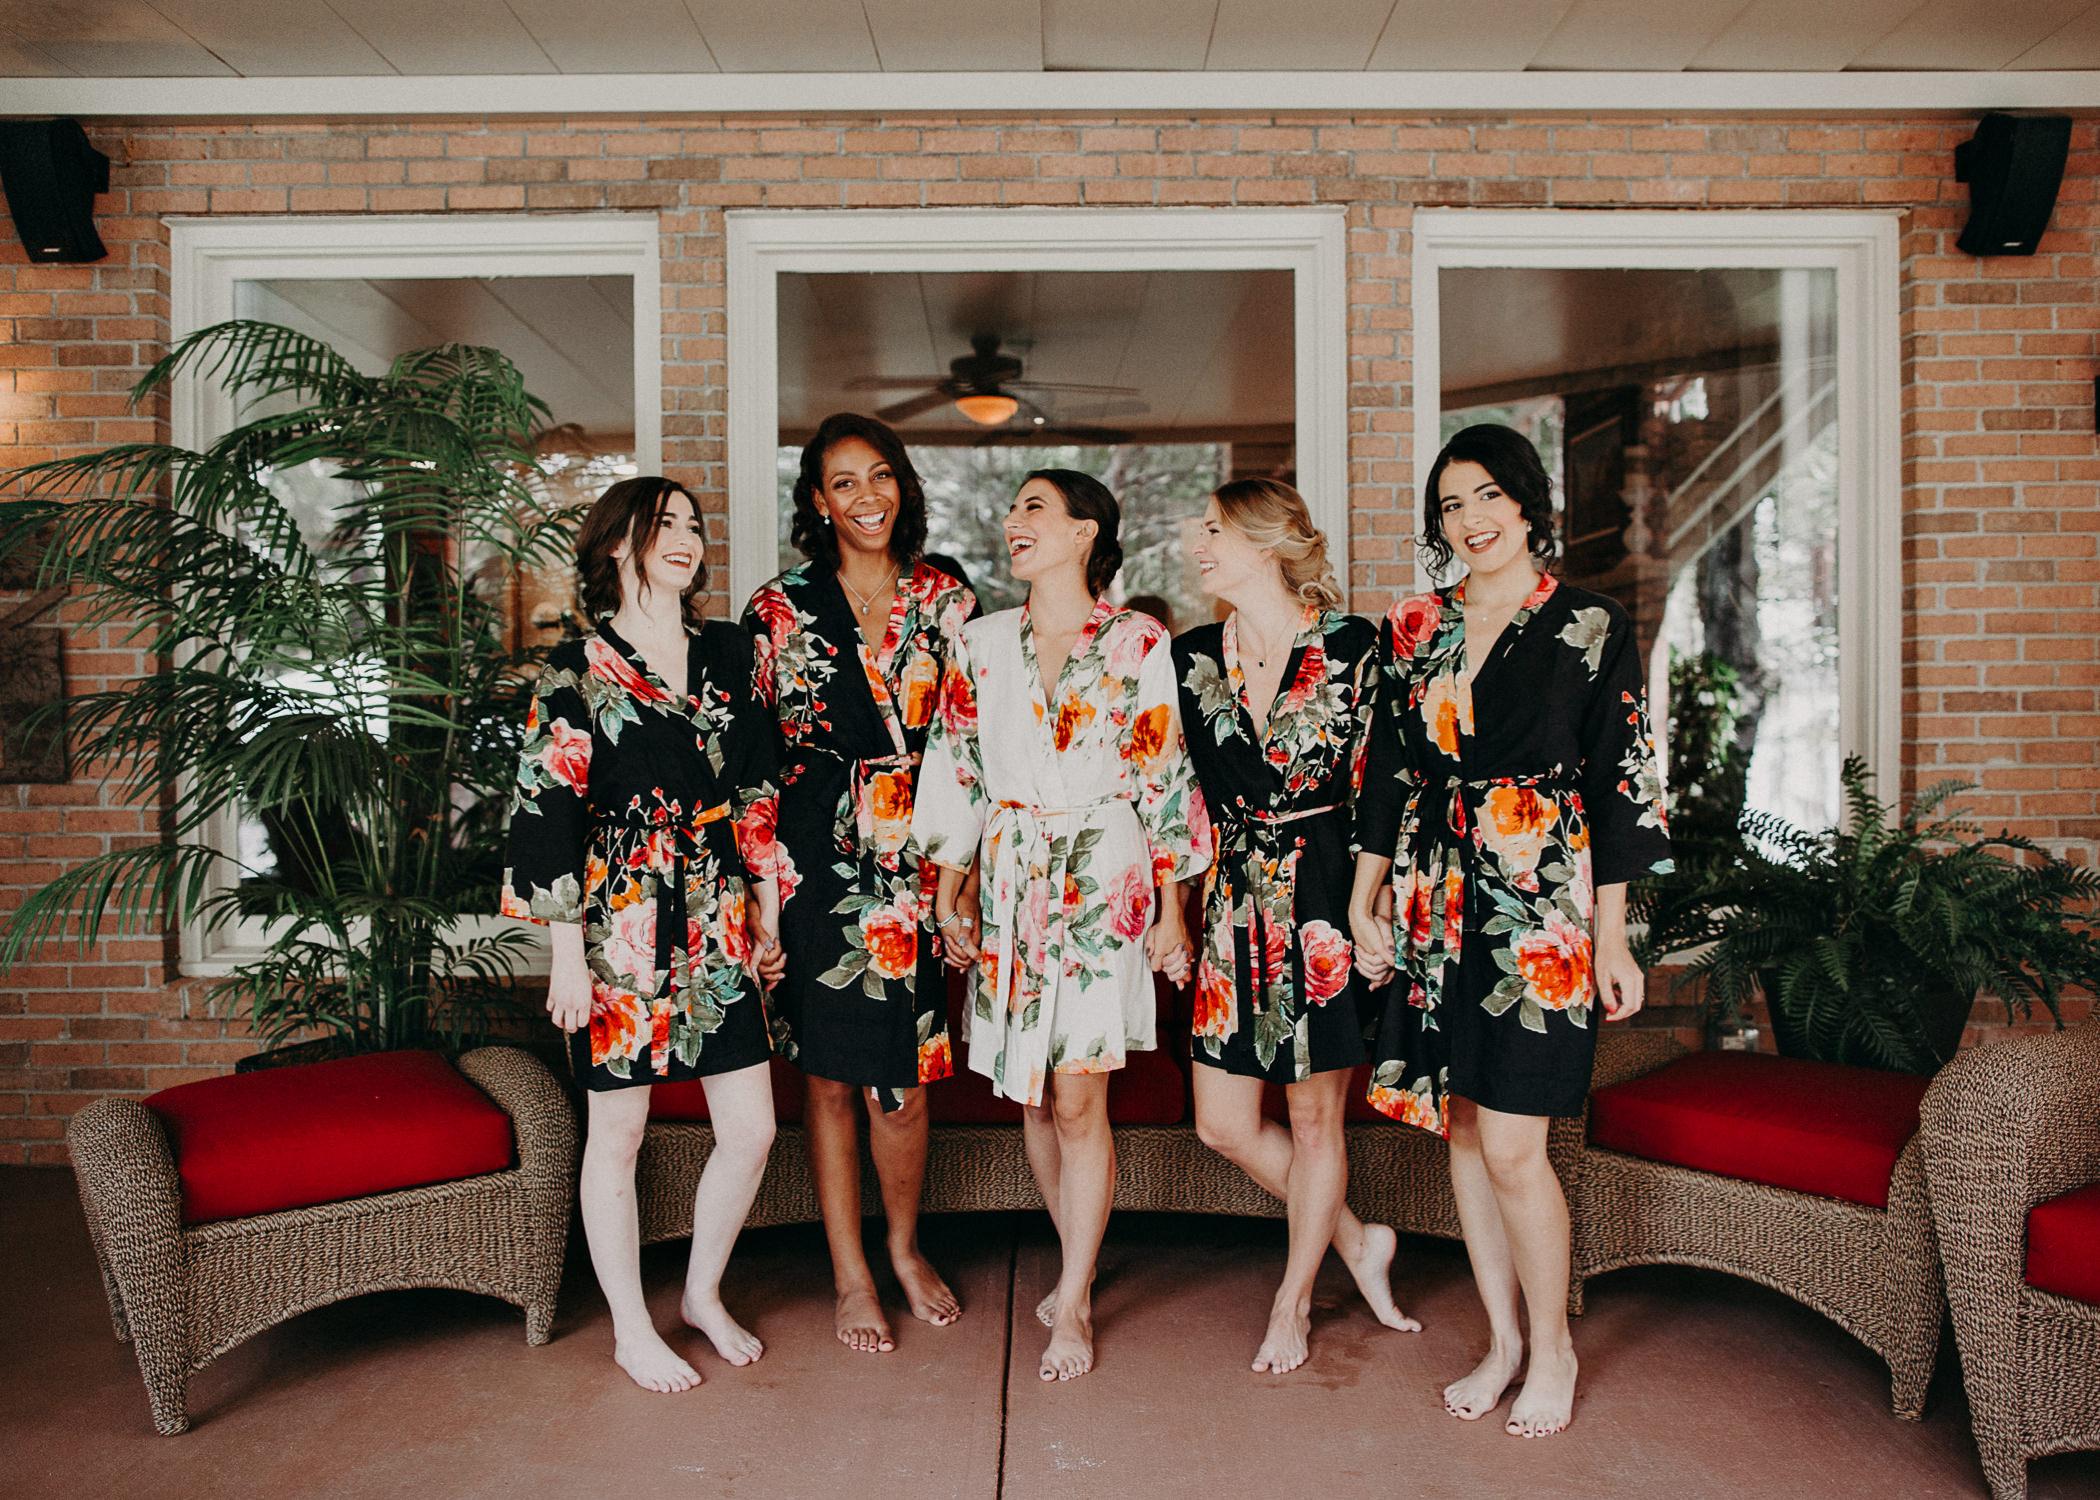 14 Bridesmaids and bride getting ready pictures, Atlanta-Ga Photographer .jpg